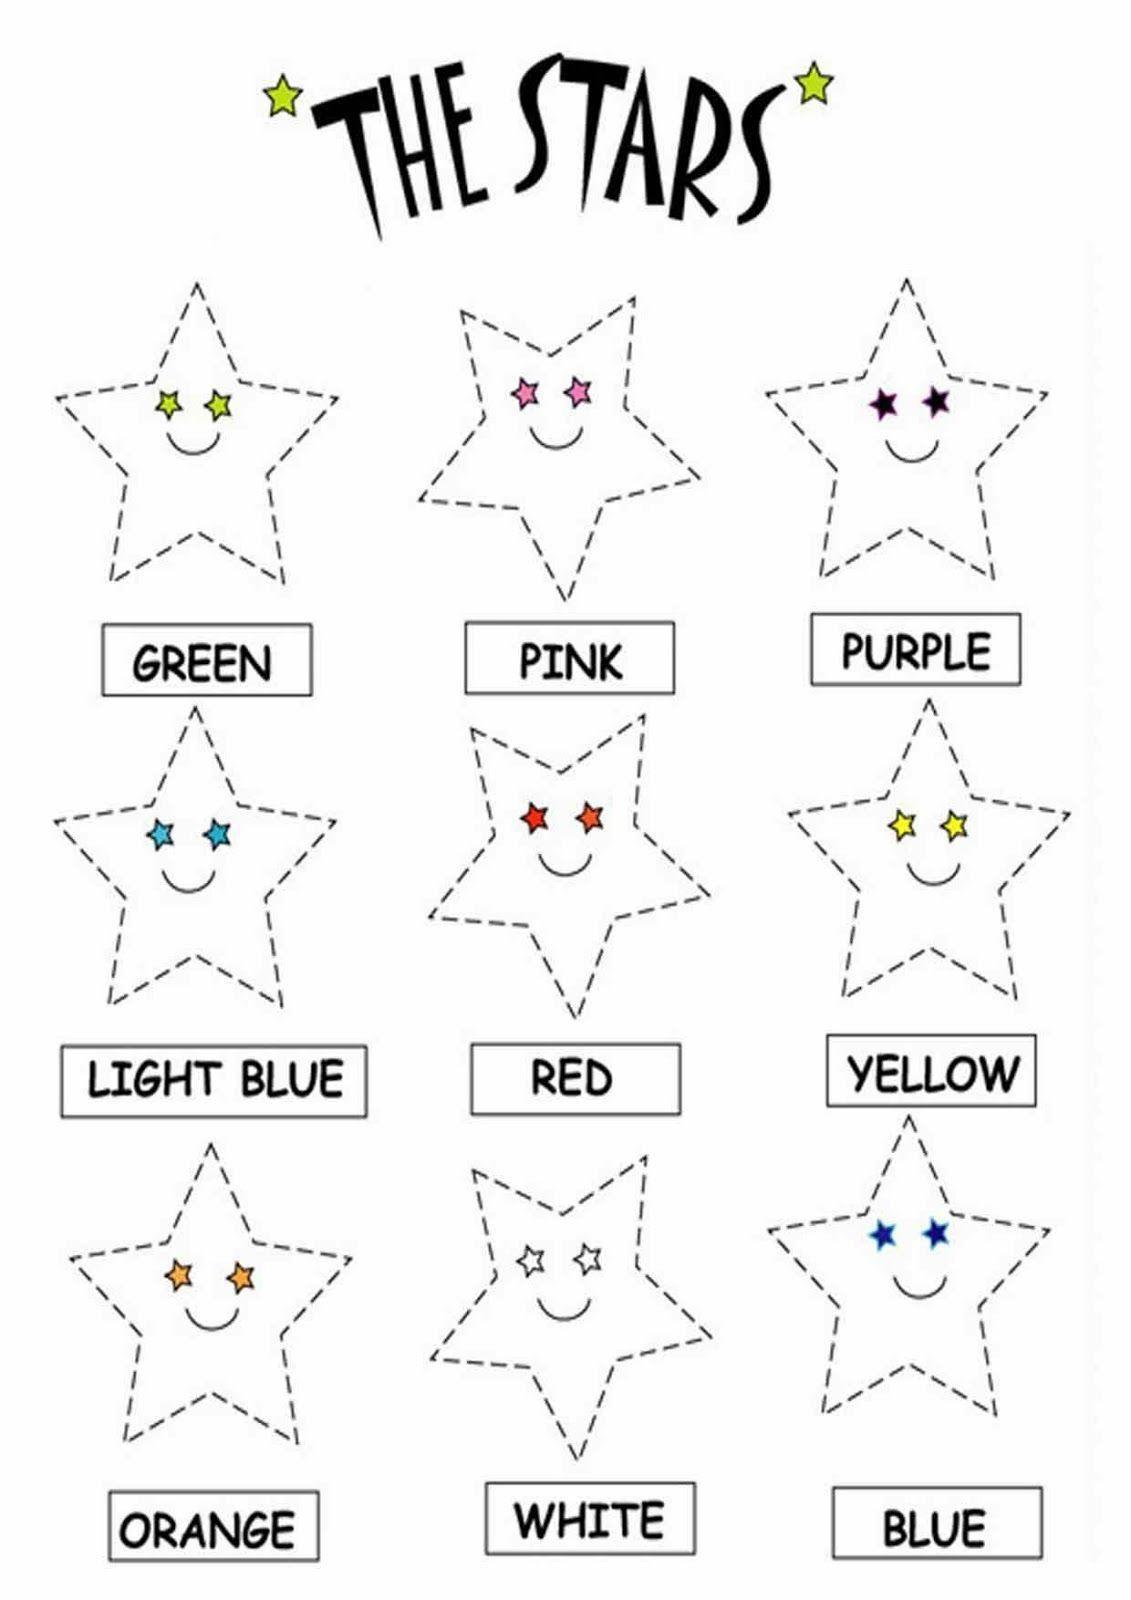 Free Printable Color Worksheets Color Worksheets Printable Preschool Worksheets Star Coloring Pages